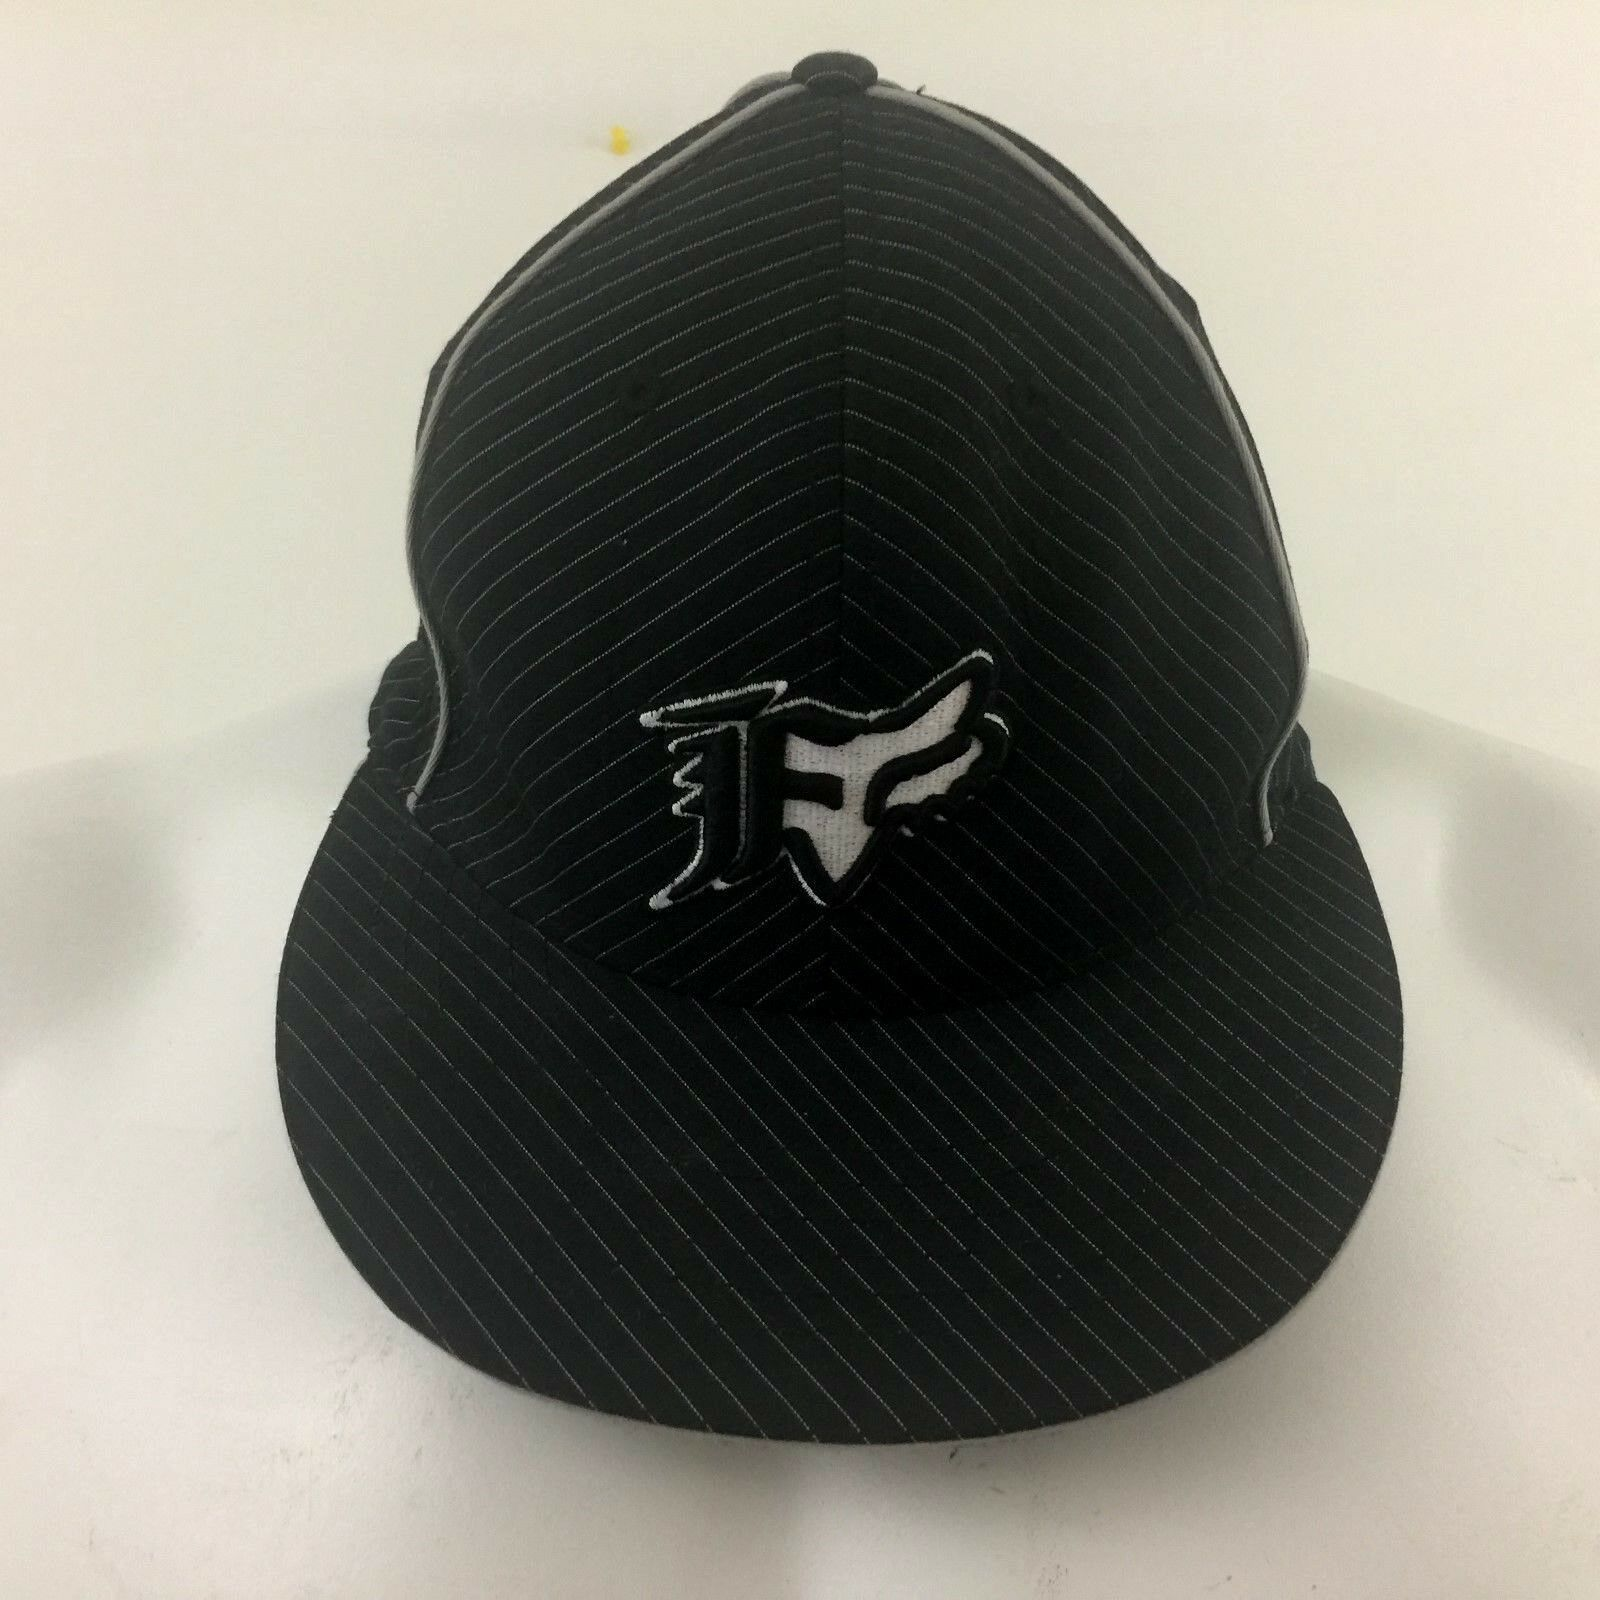 Fox Flex Racing Ball Cap Black Striped Flex Fox Fit Cotton Blend L/XL f52e6e